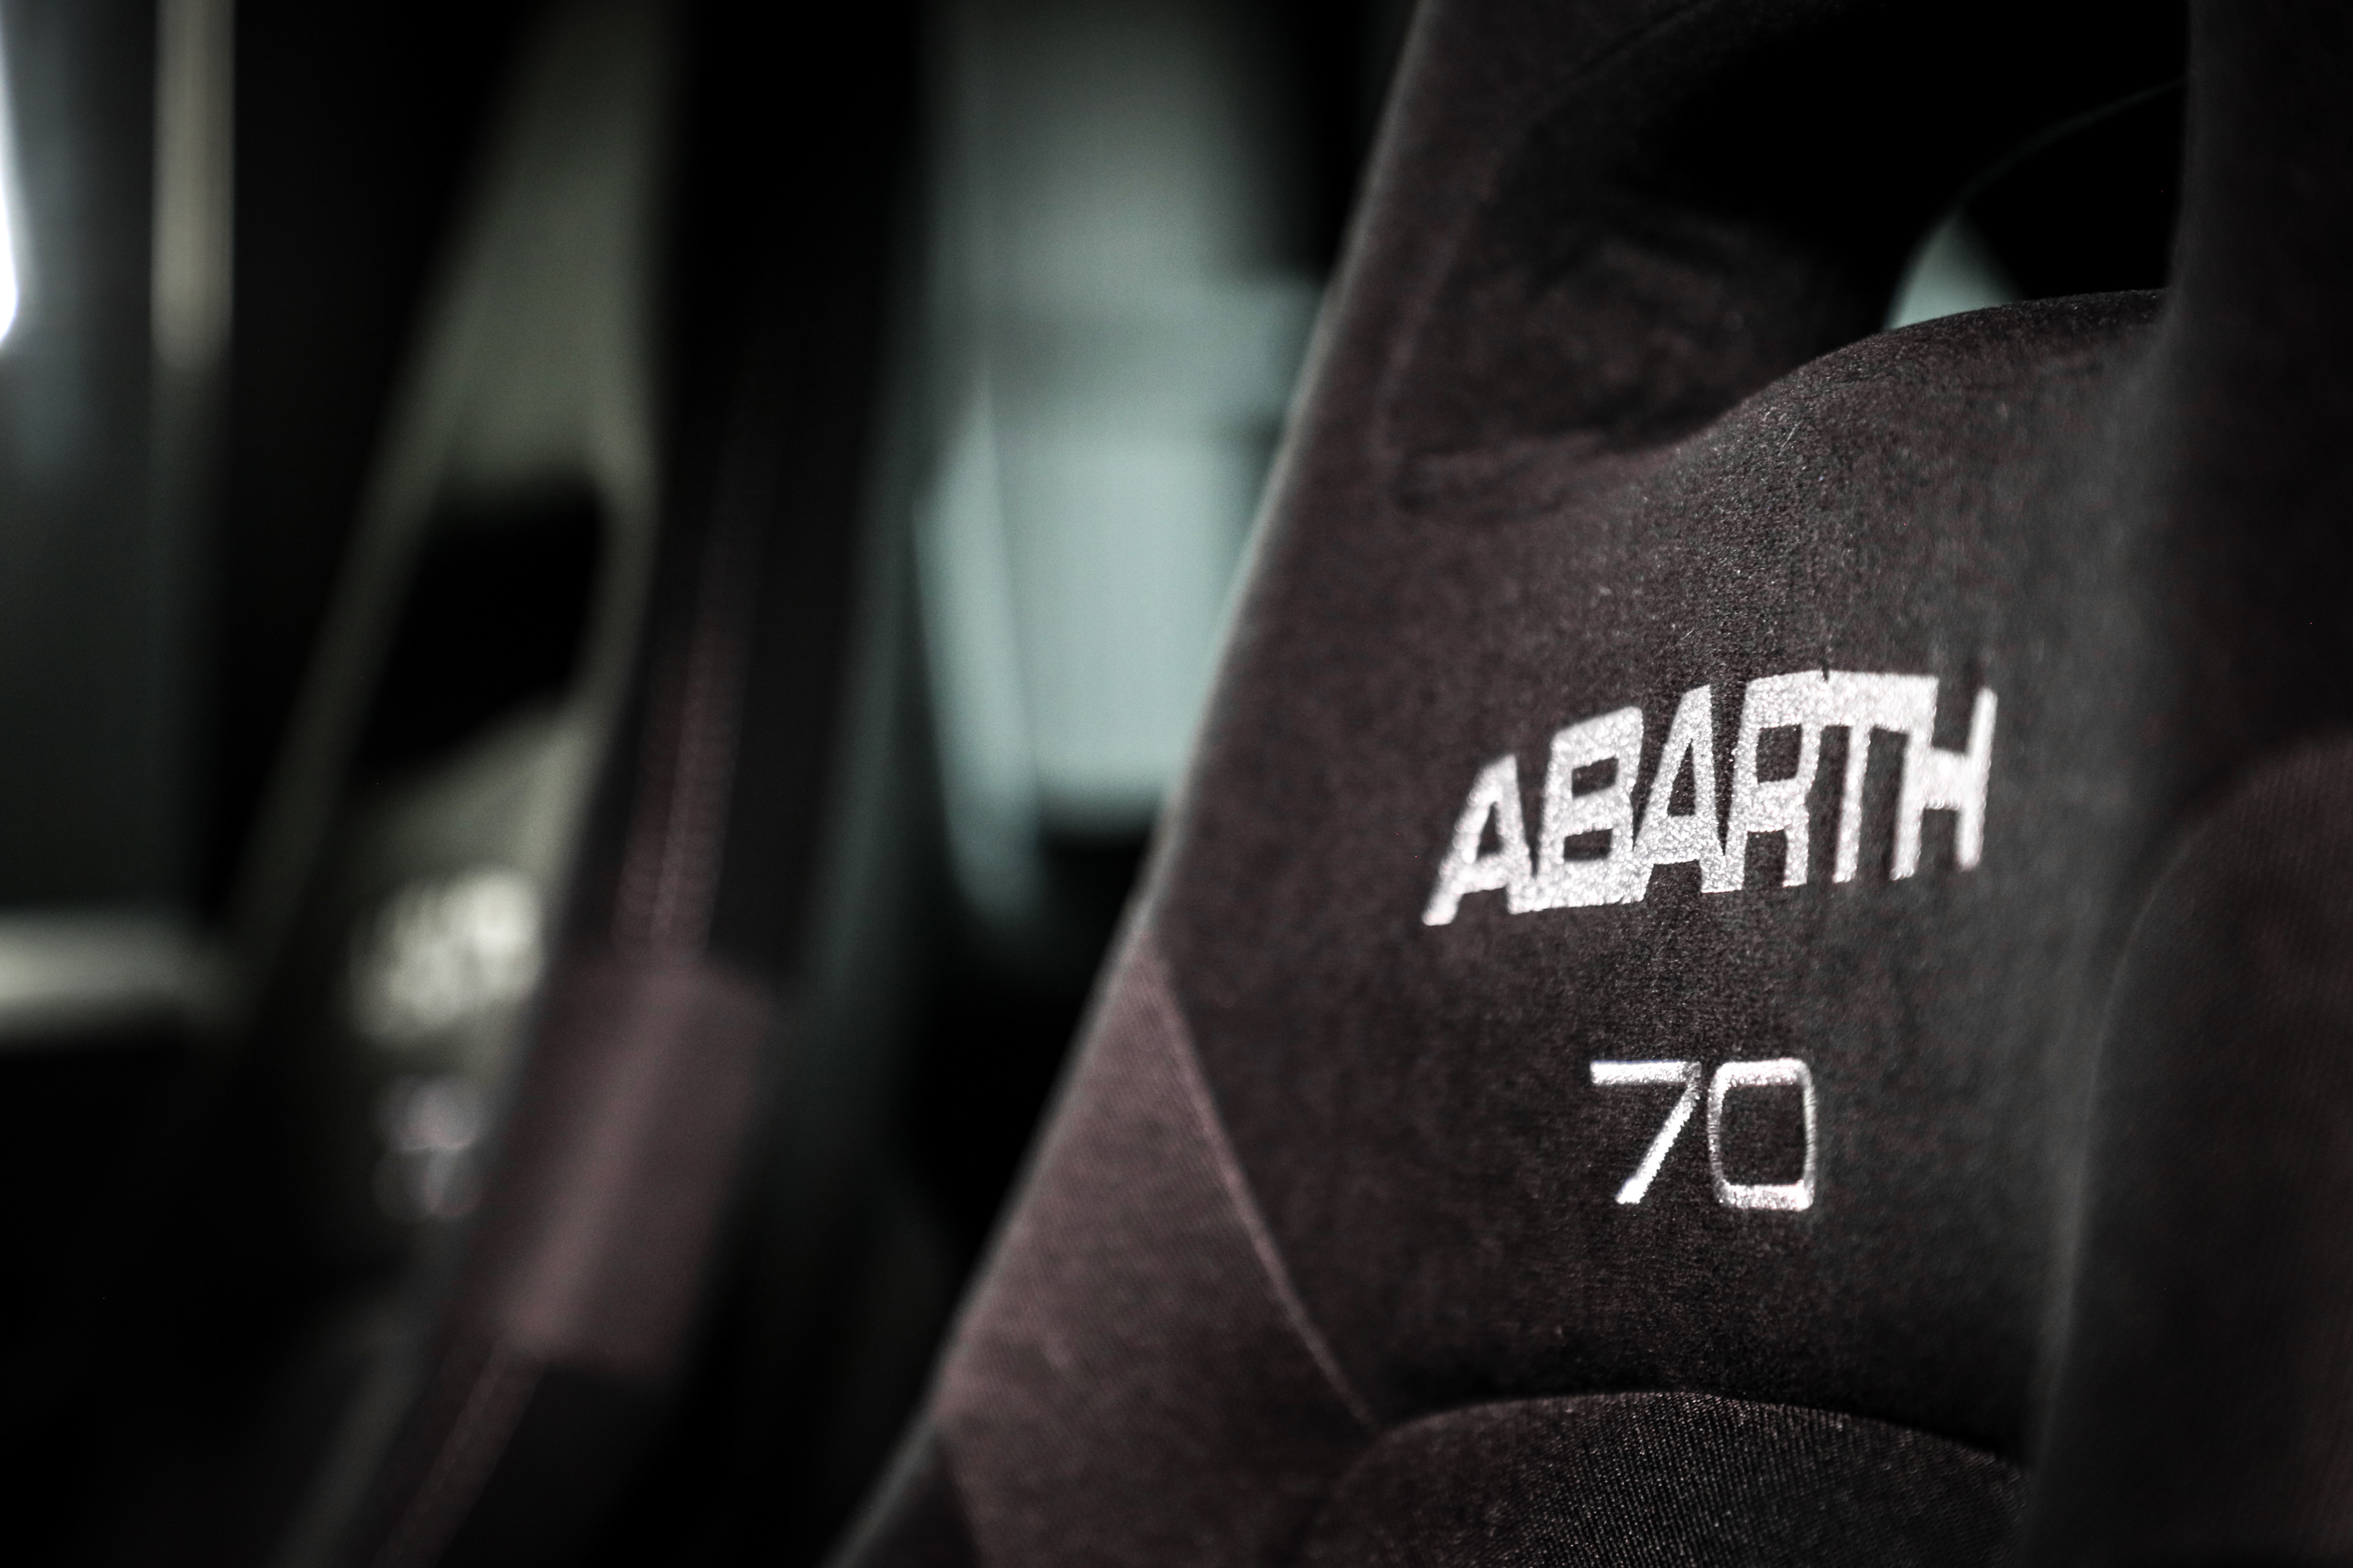 Abarth 595 Pista 2019